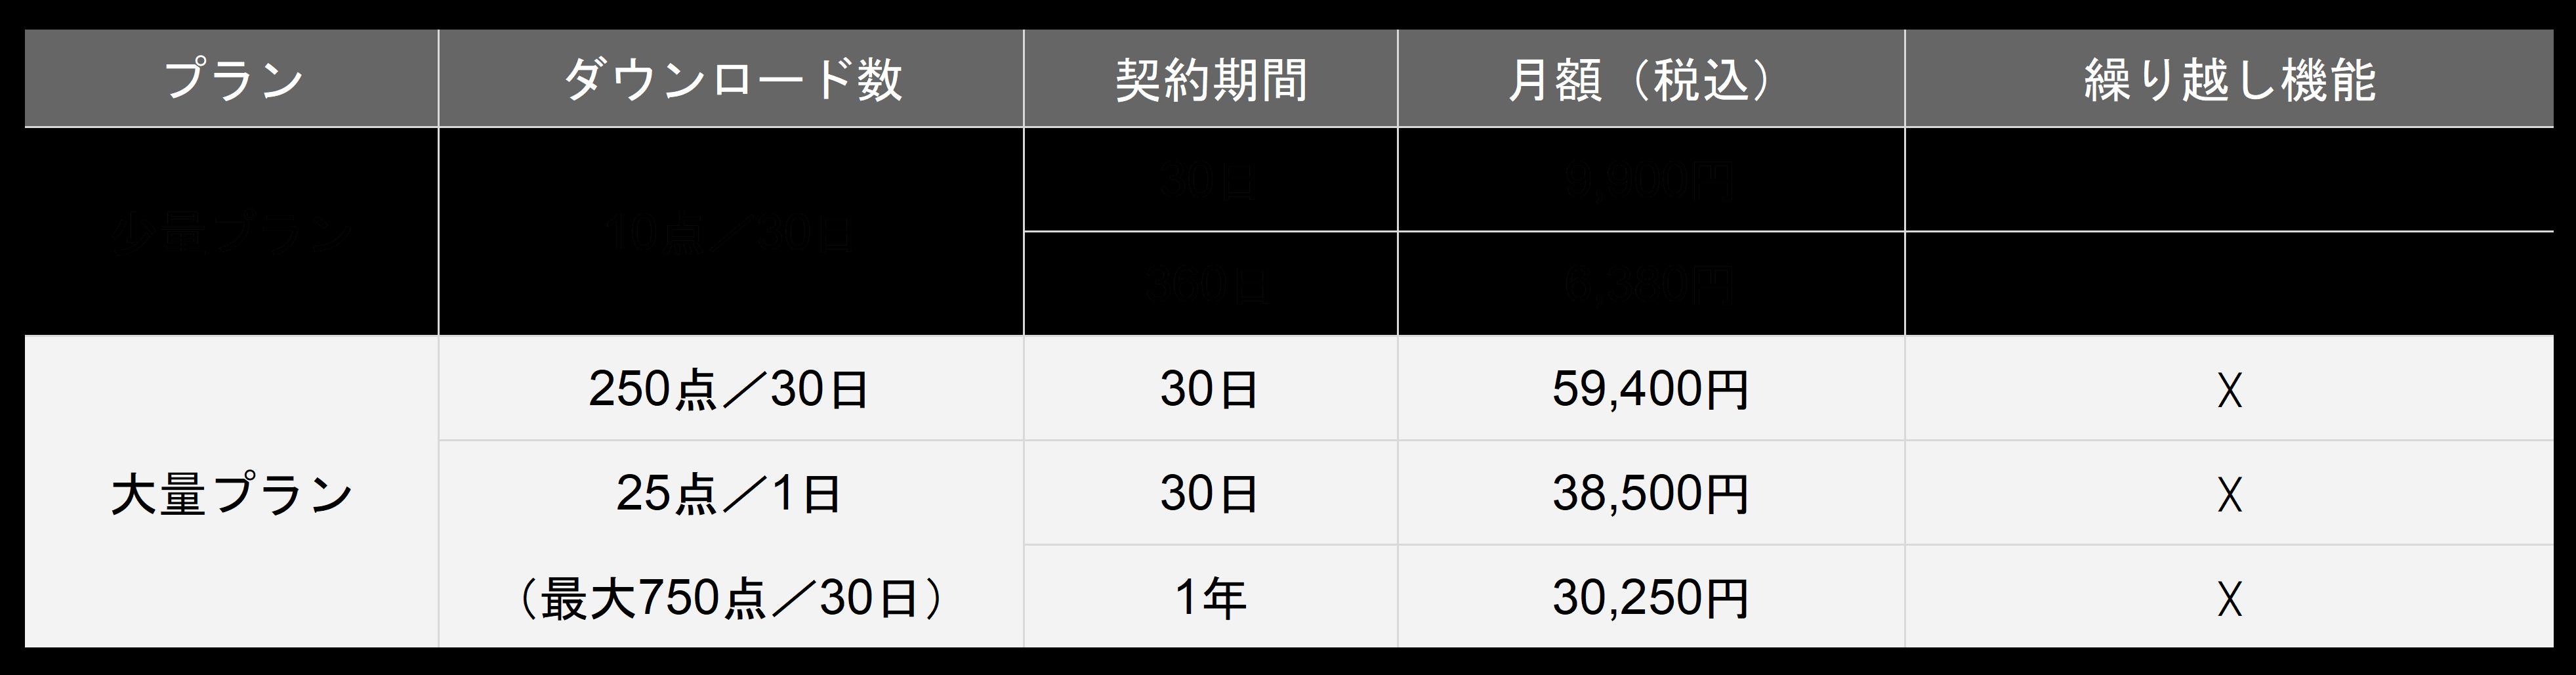 20200225_image2.png